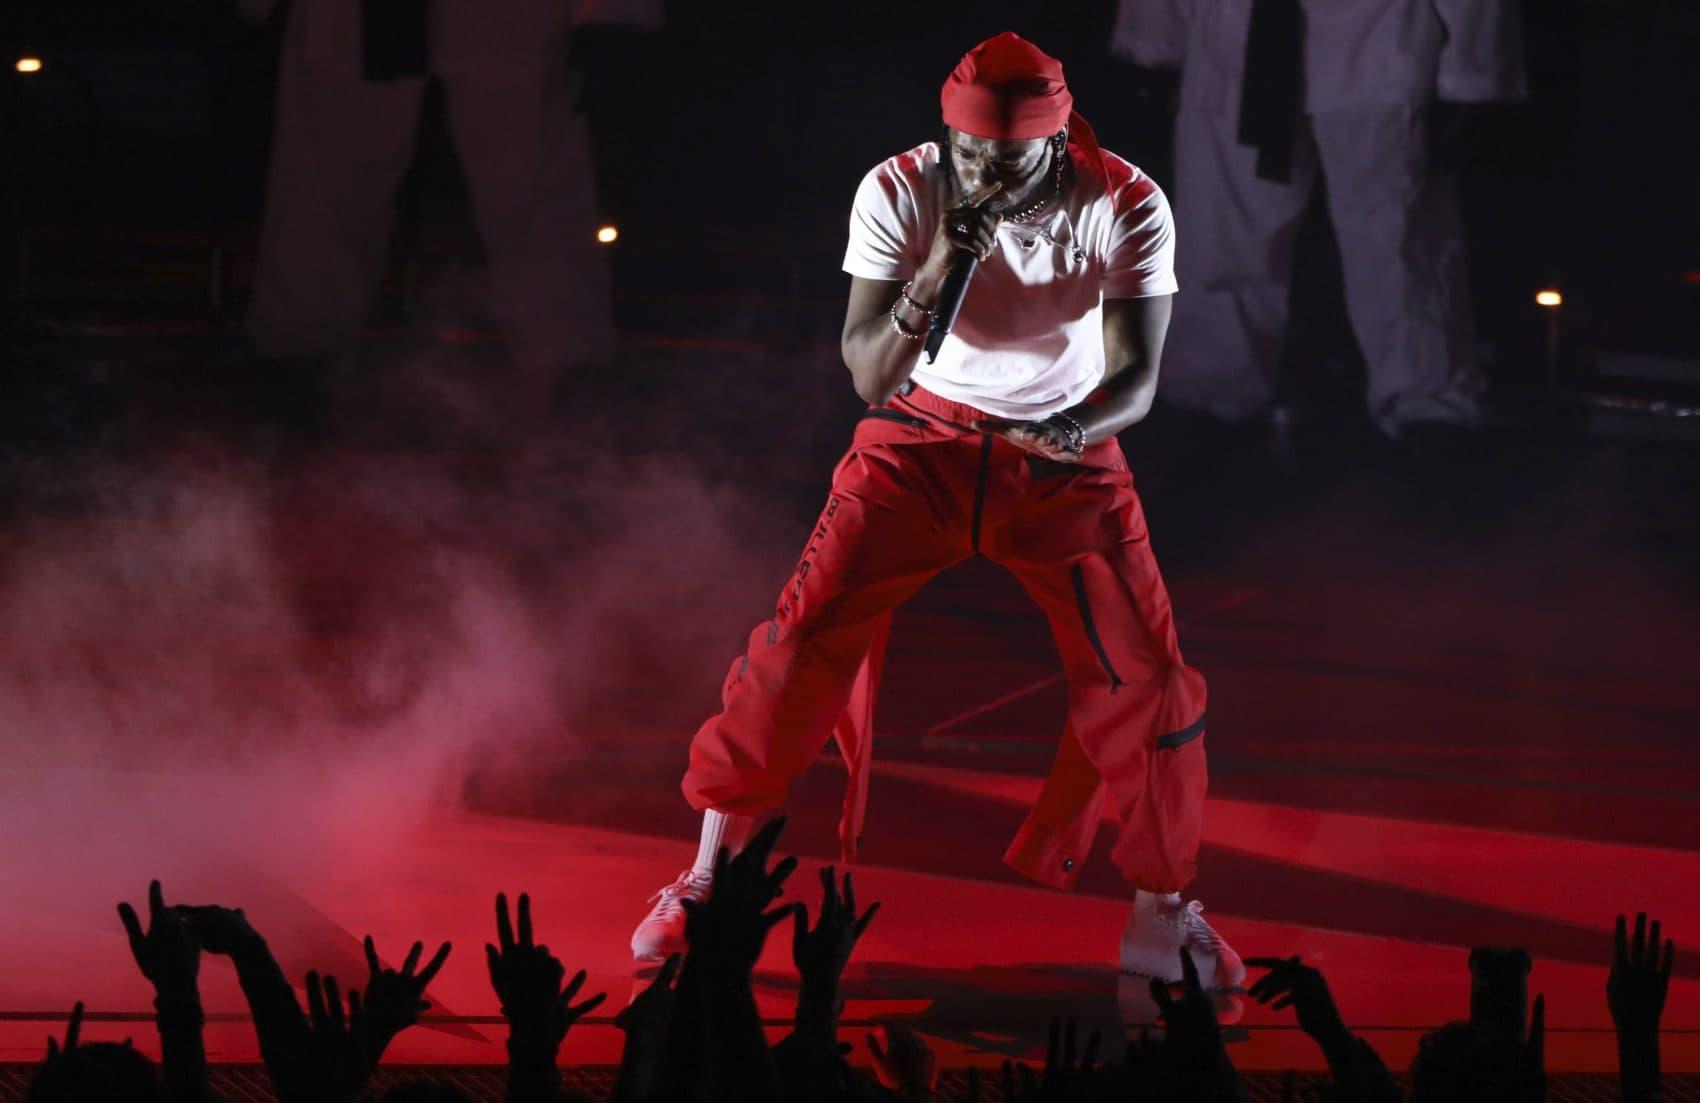 Kendrick Lamar performs at the MTV Video Music Awards in August 2017. (Matt Sayles/Invision/AP)